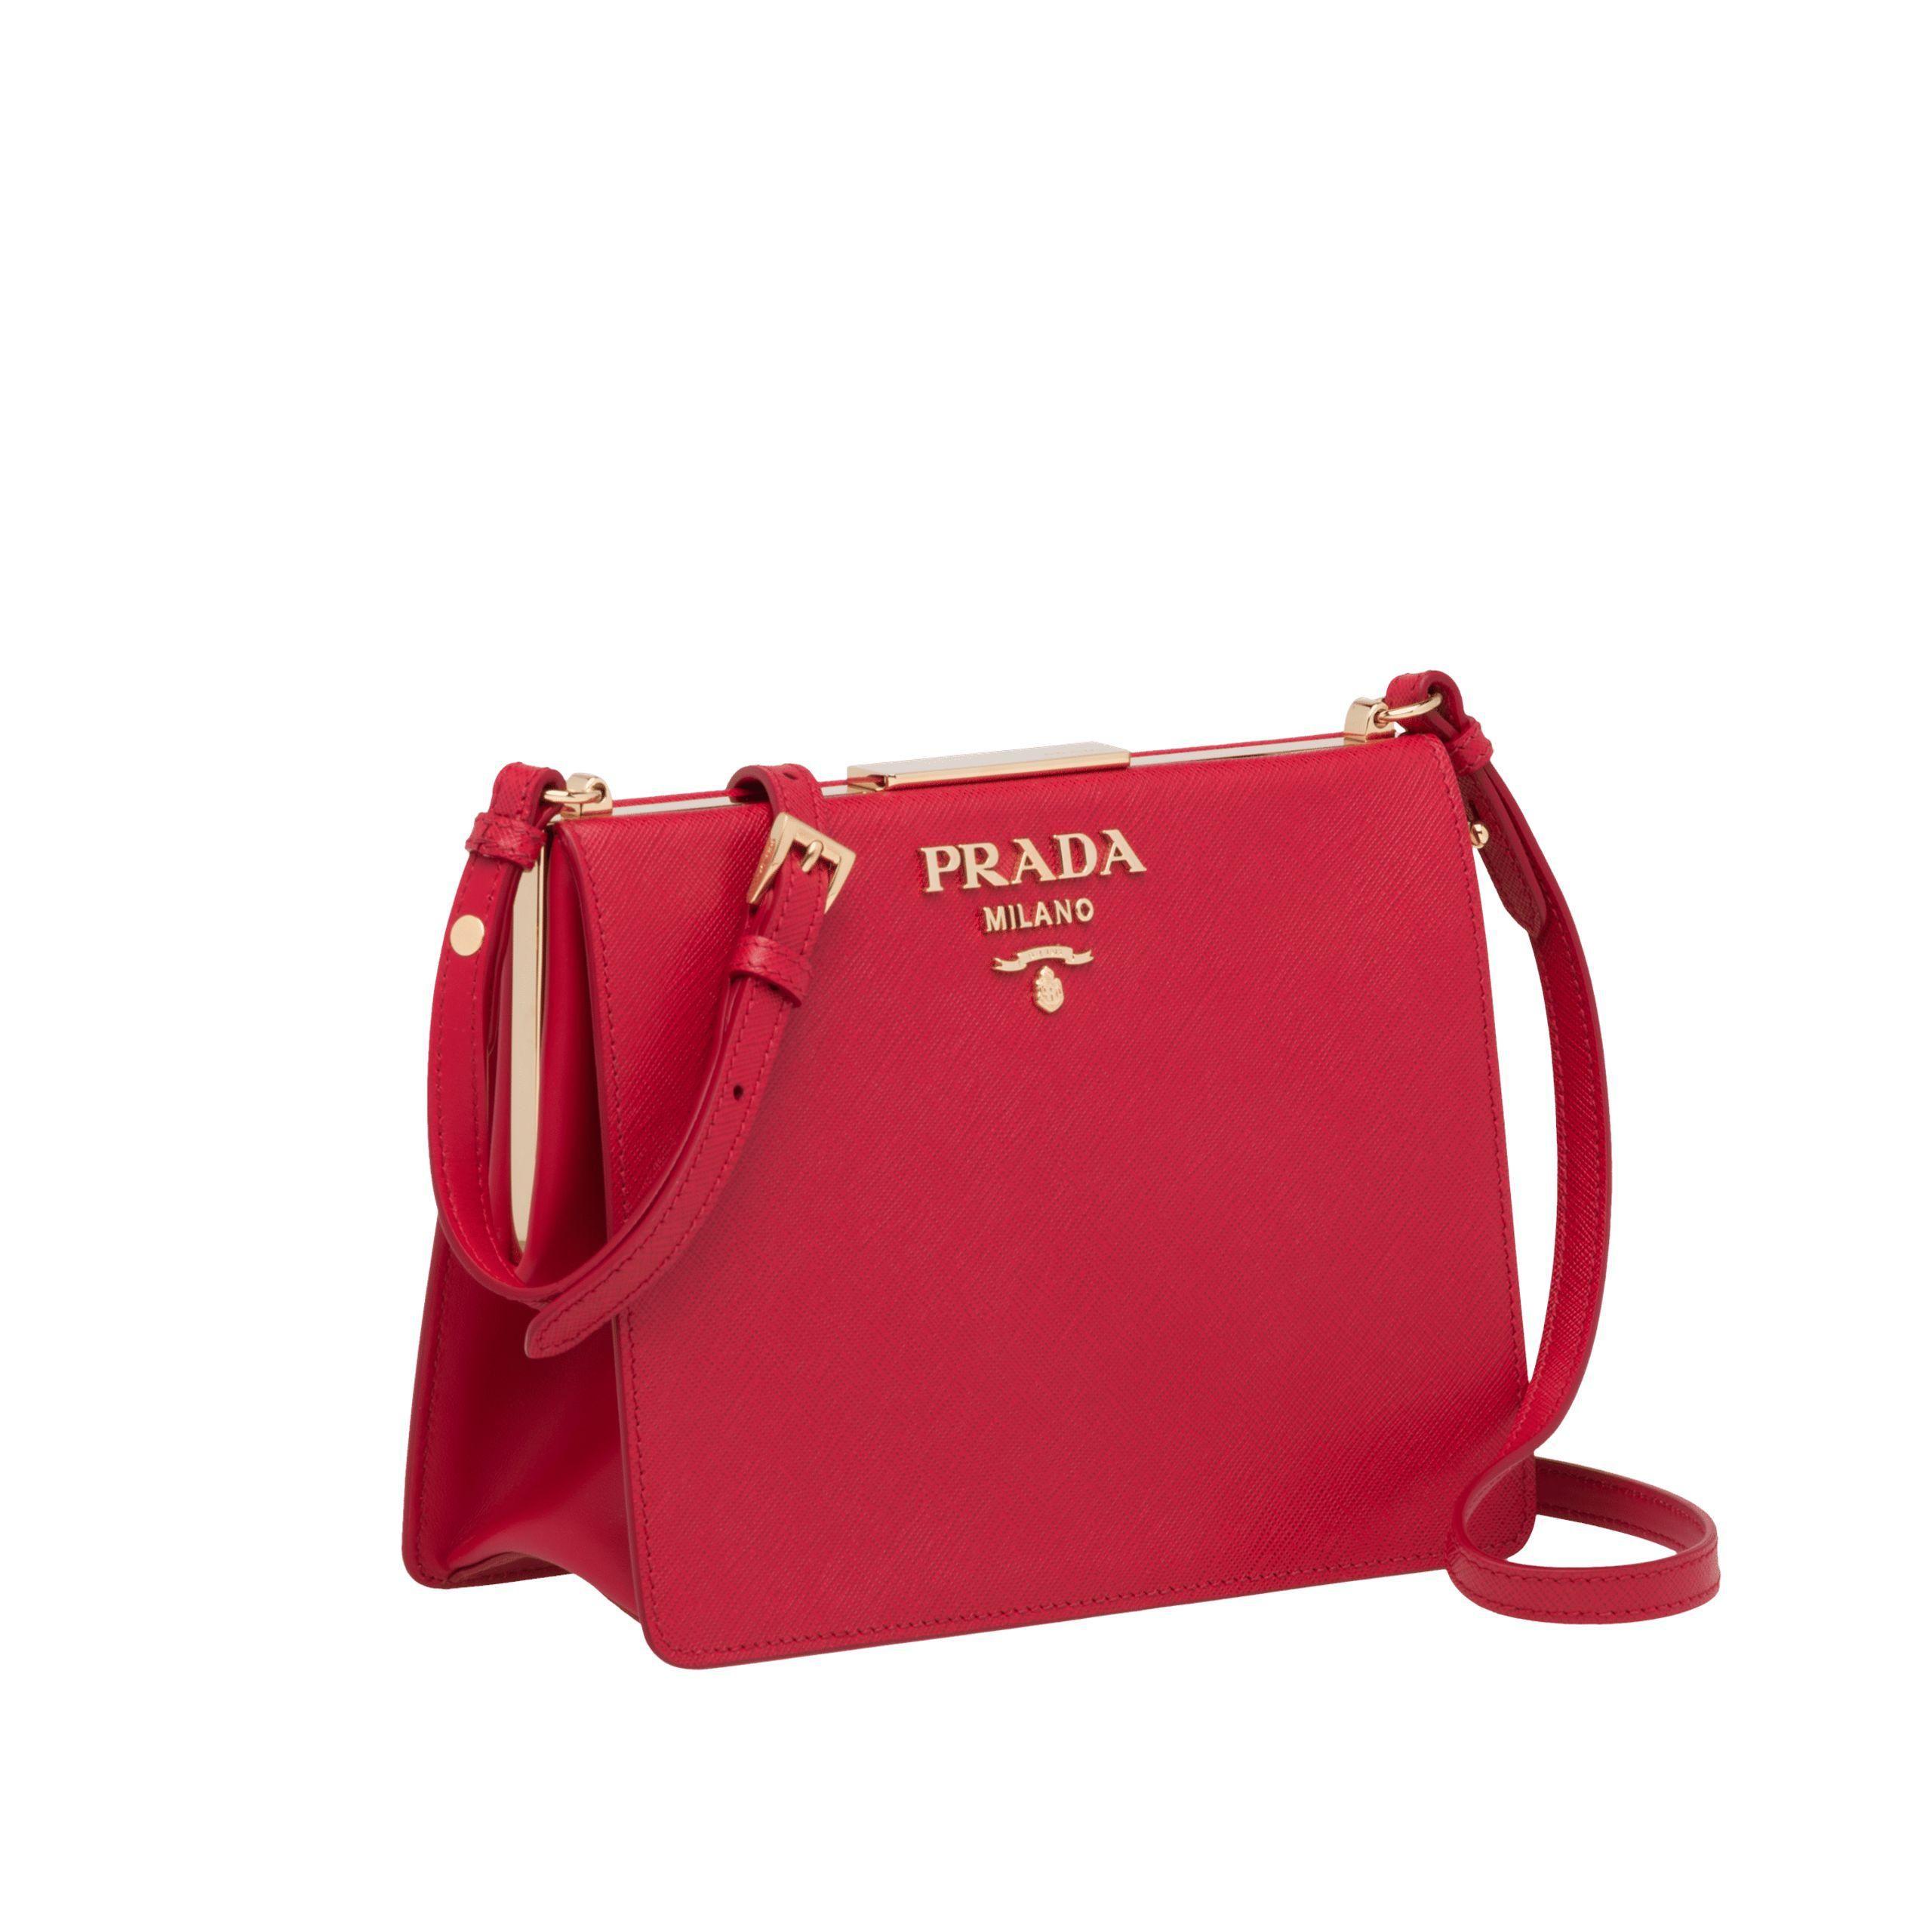 Lyst - Prada Light Frame Saffiano Leather Bag in Red b0785dc702b84